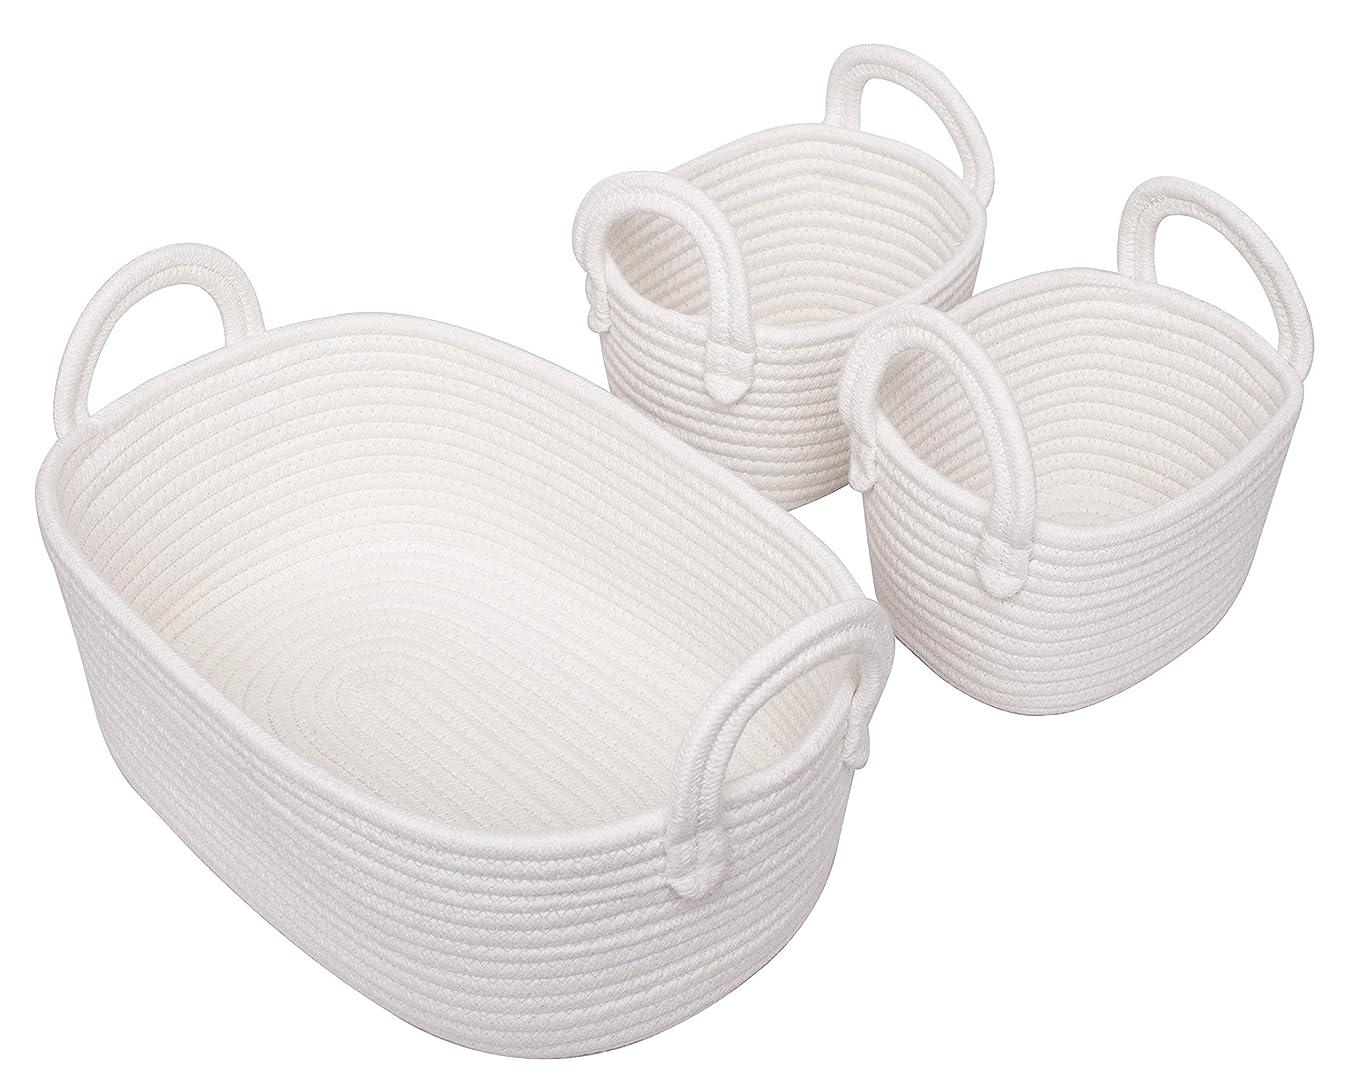 Cotton Rope Storage Baskets, Set of 3 Toy Organizer for Woven Nursery Decor, Gift Basket